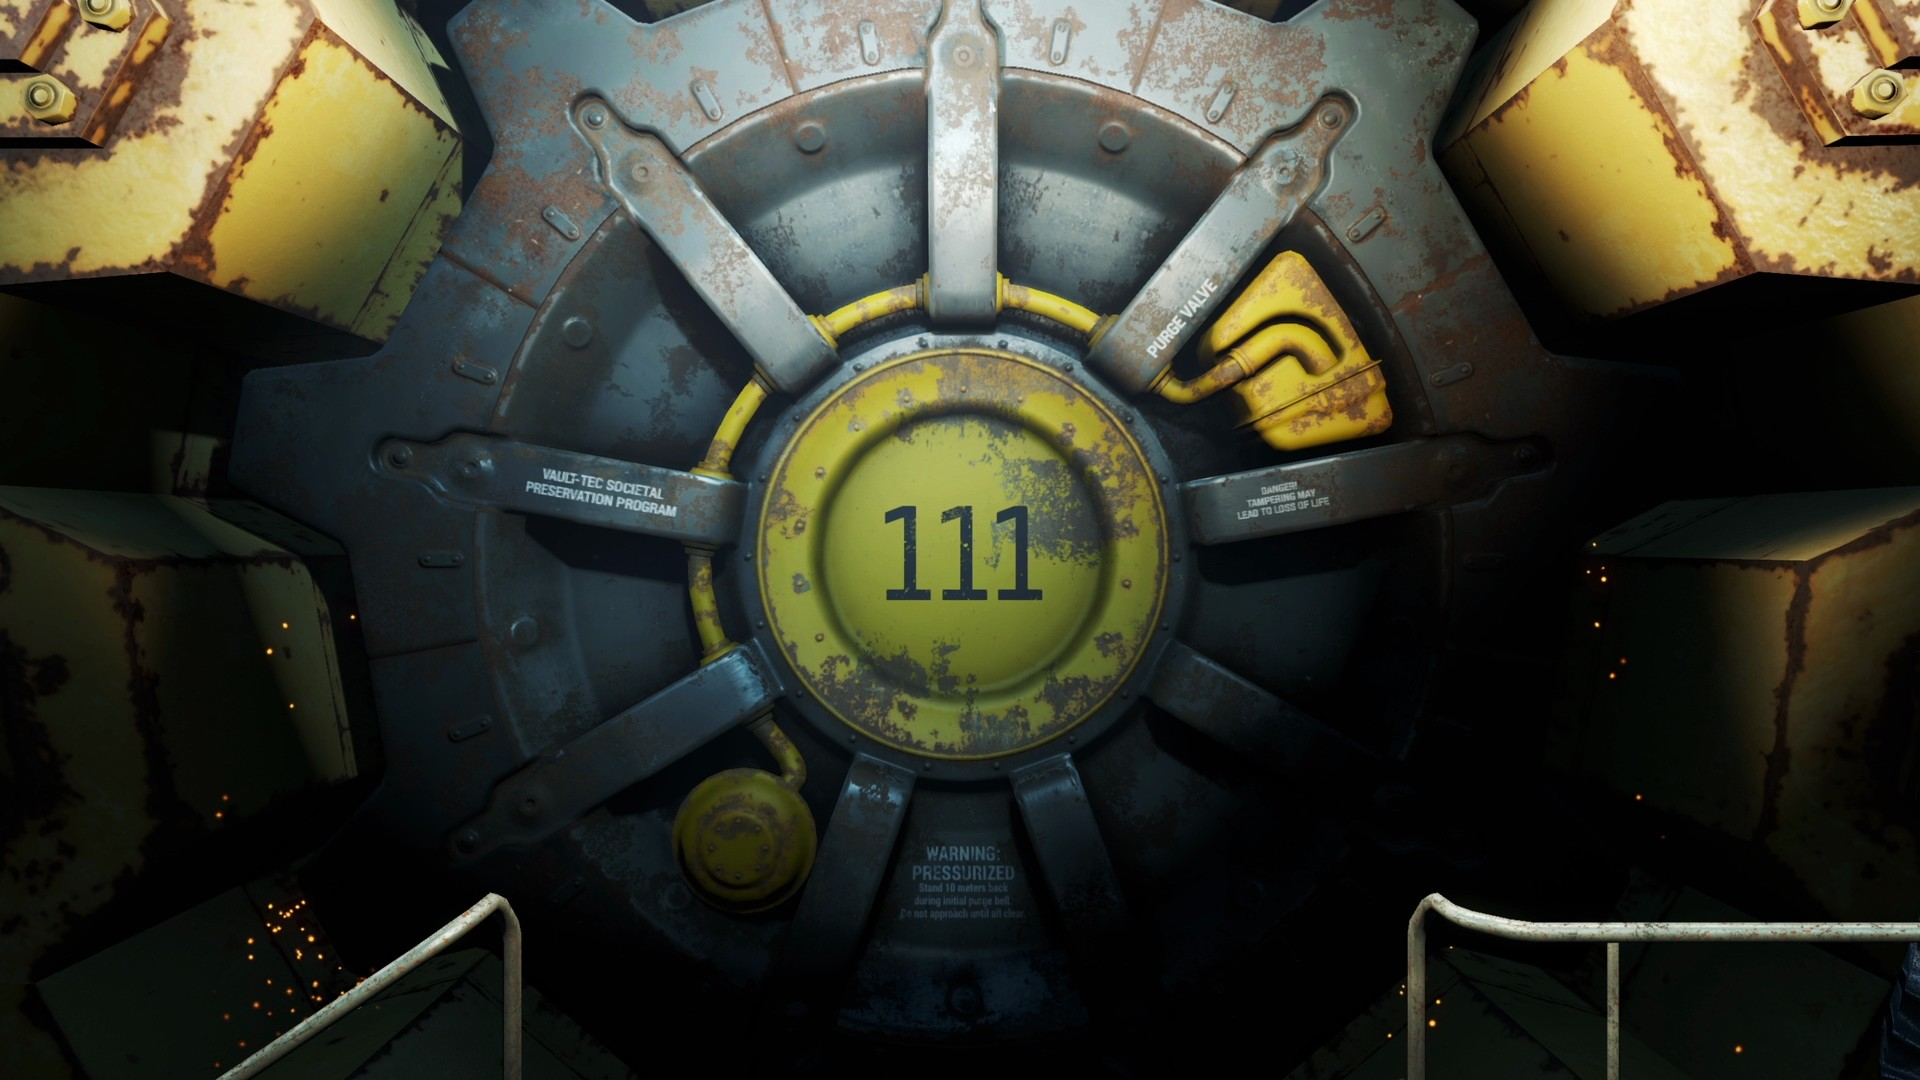 Fallout 4 Wallpaper Hd Fallout 4 Wallpaper Phone